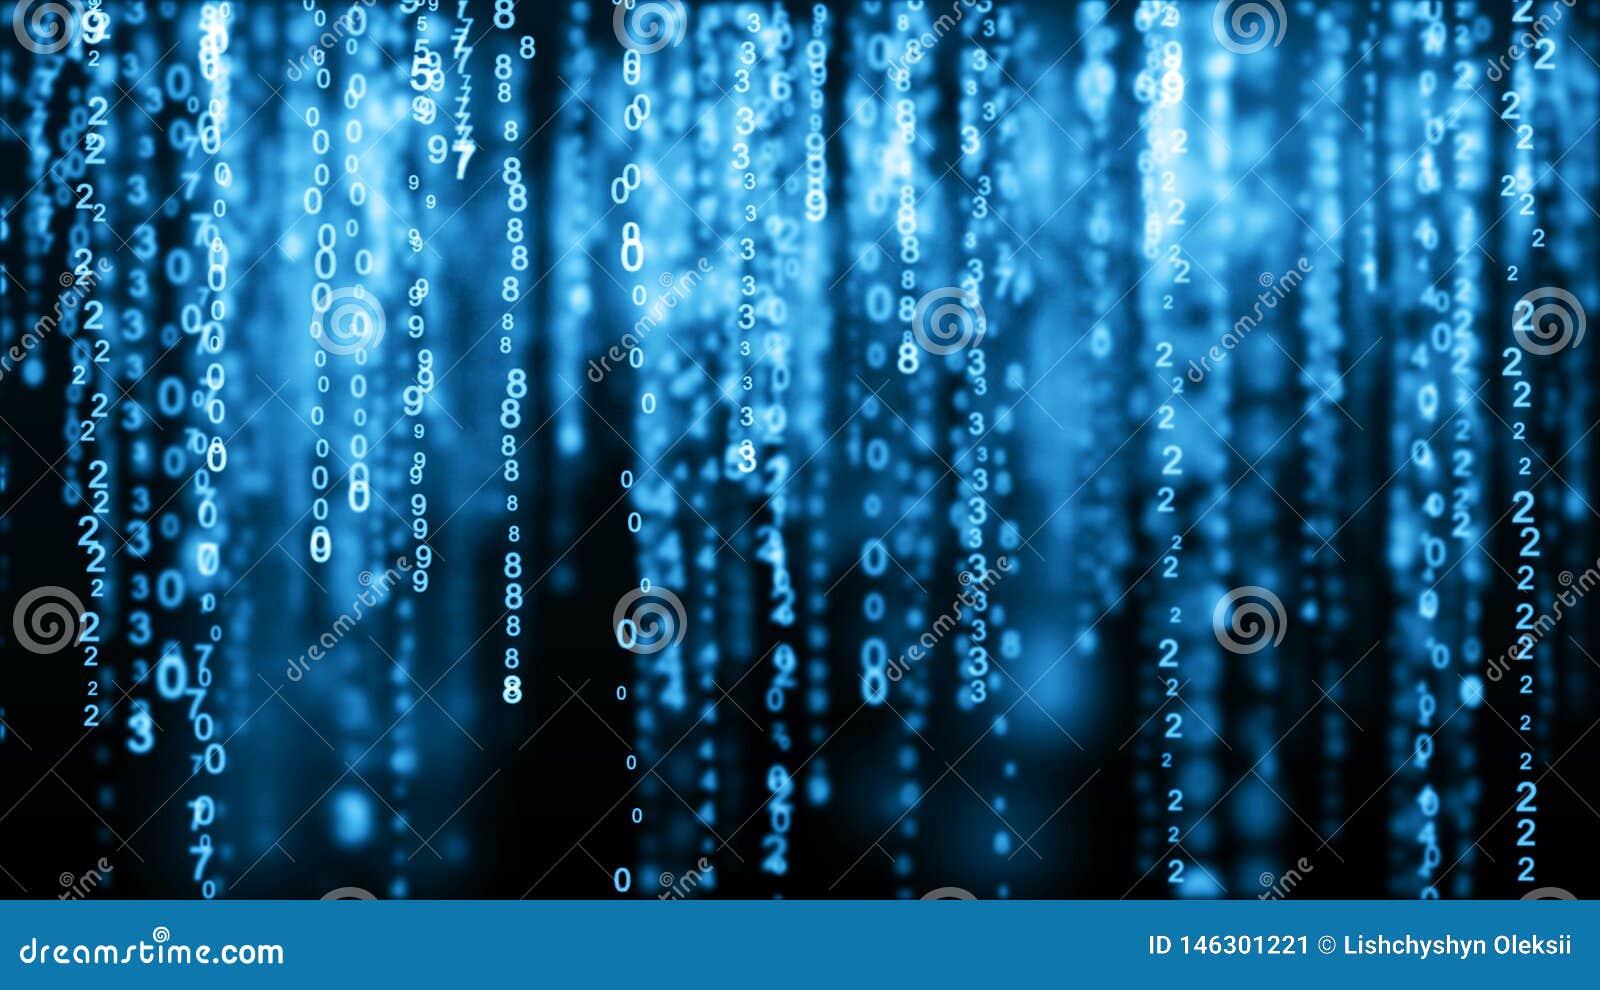 Matrice bleue de fond de Digital Code machine binaire Concept de pirate informatique rendu 3d